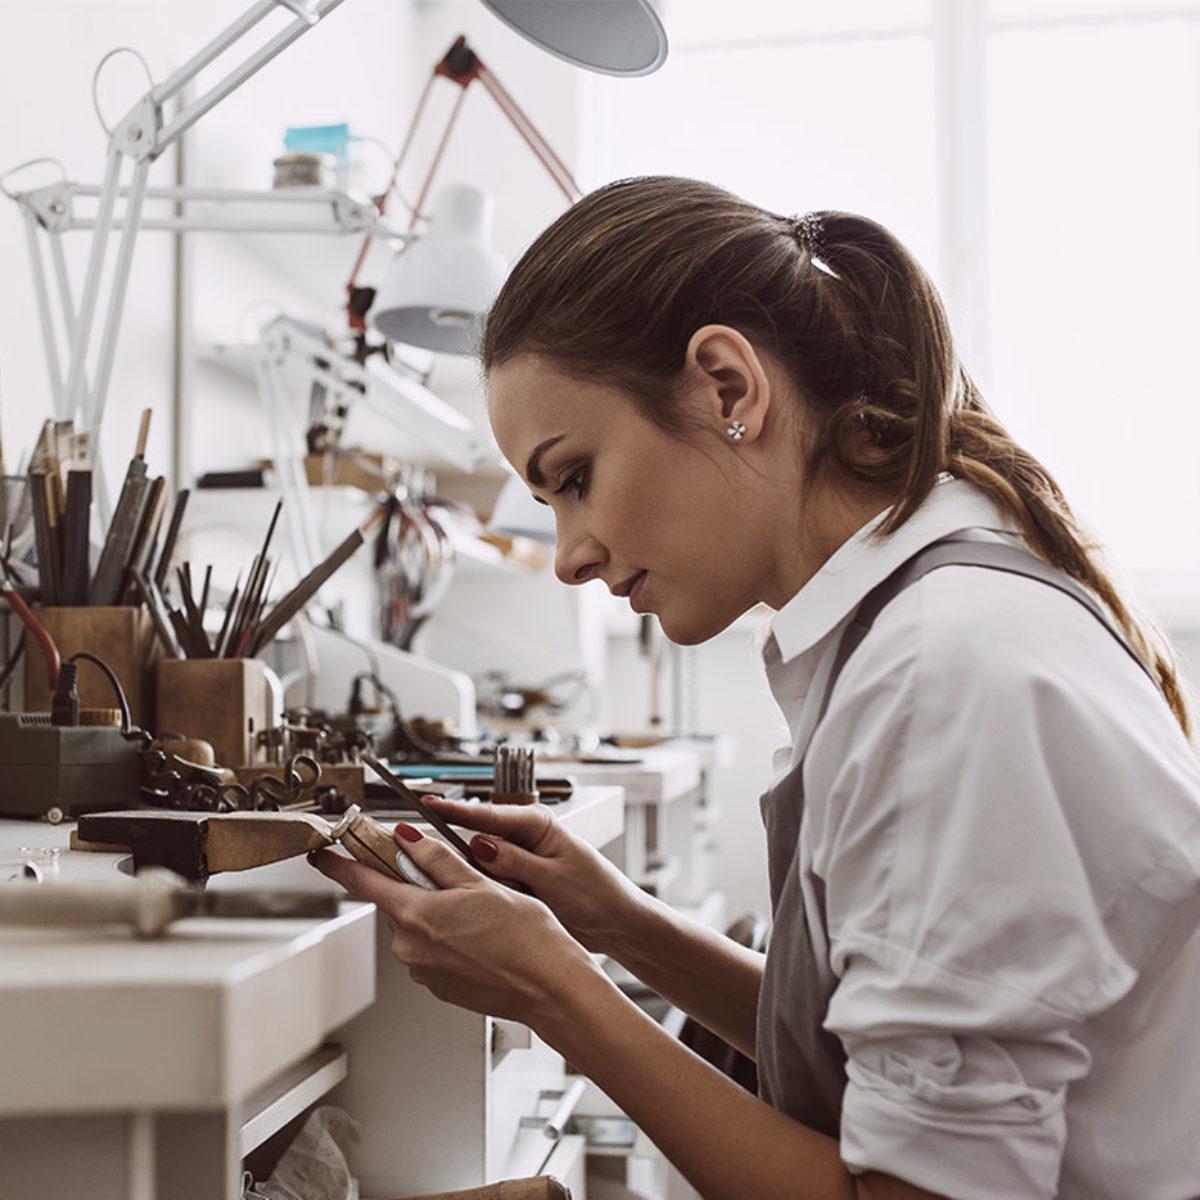 Josef Bergs taken over Hillebrand jewelry metal production